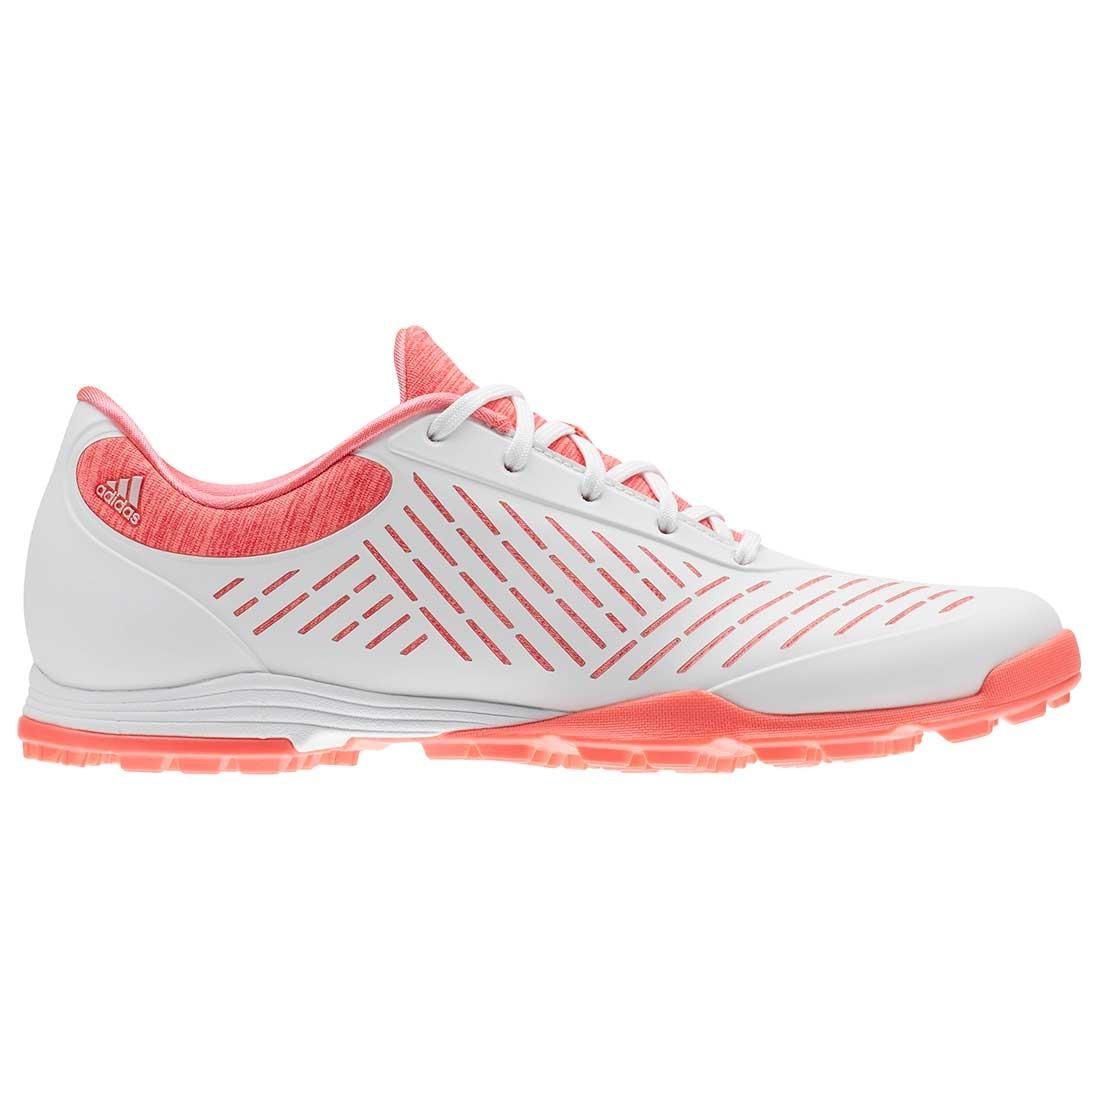 Adidas Women's AdiPure Sport 2.0 Golf Shoes White/Red Zest   eBay